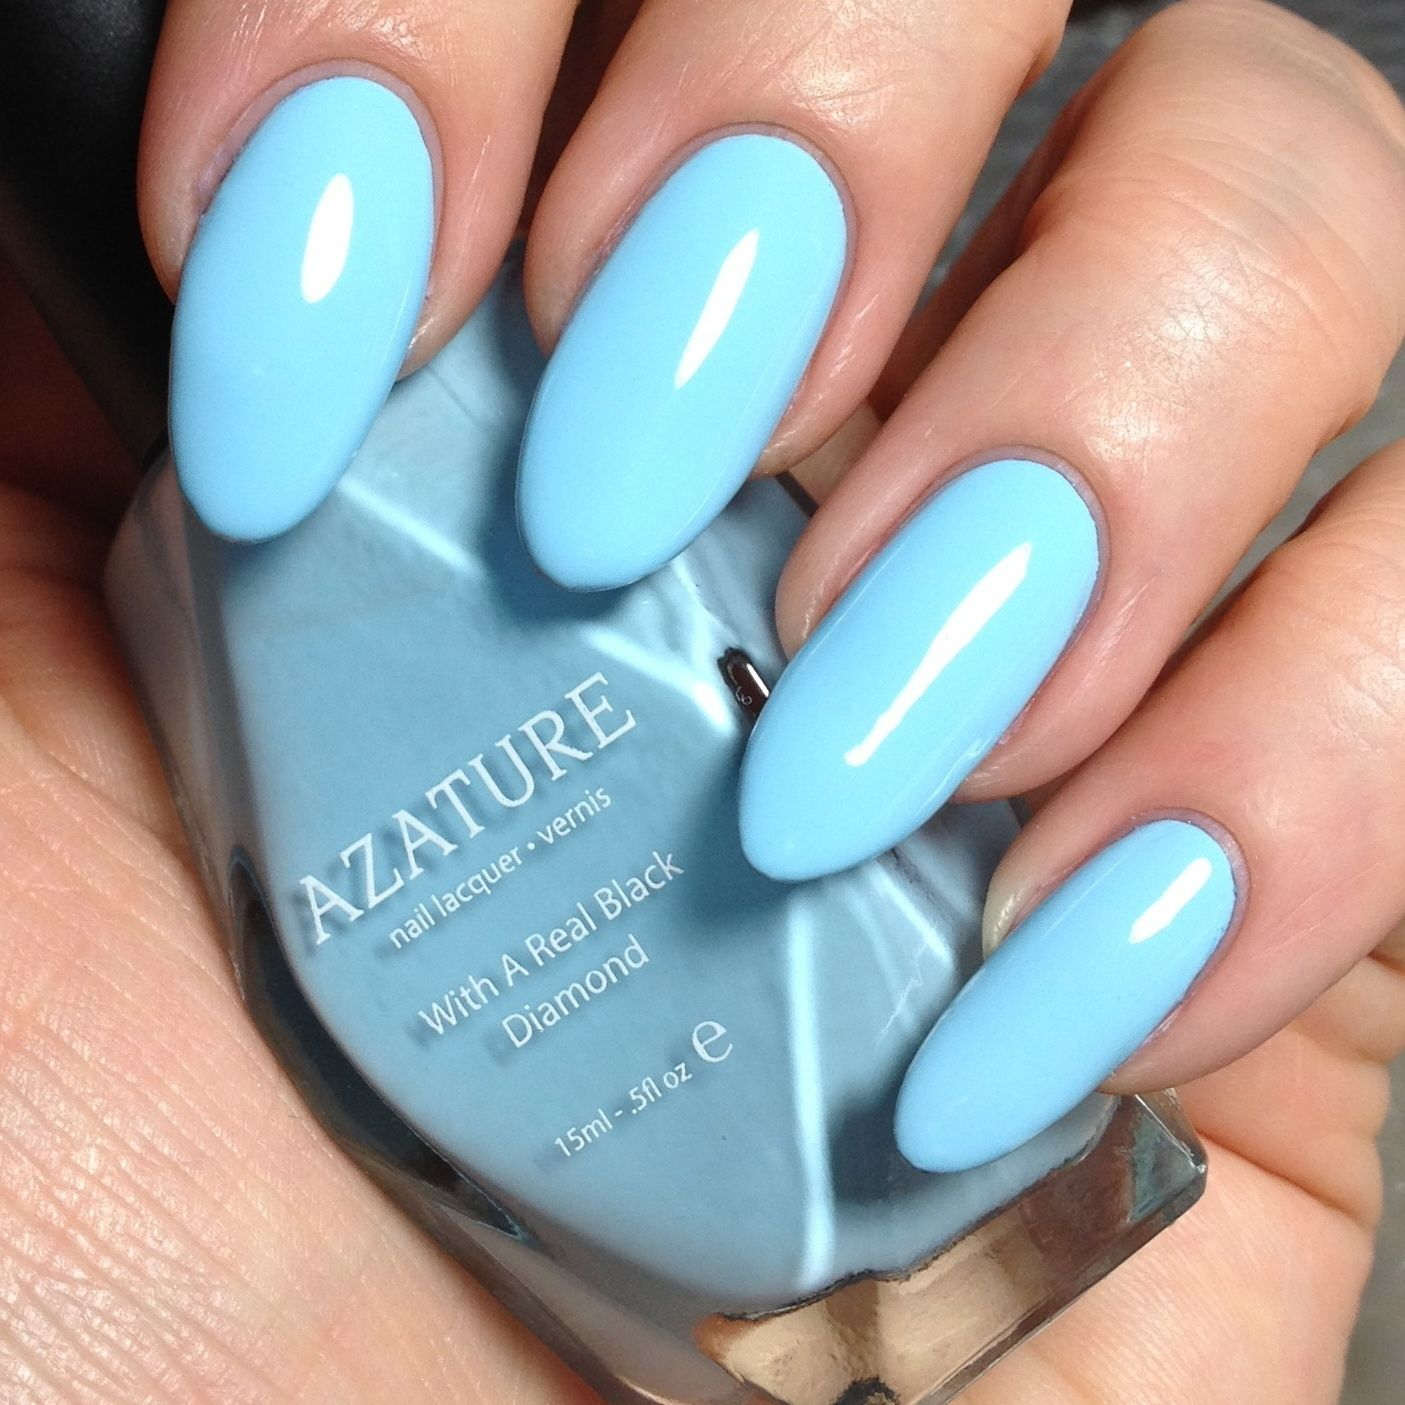 Azature black diamond nail polish in Light Blue Diamond. The entire ...